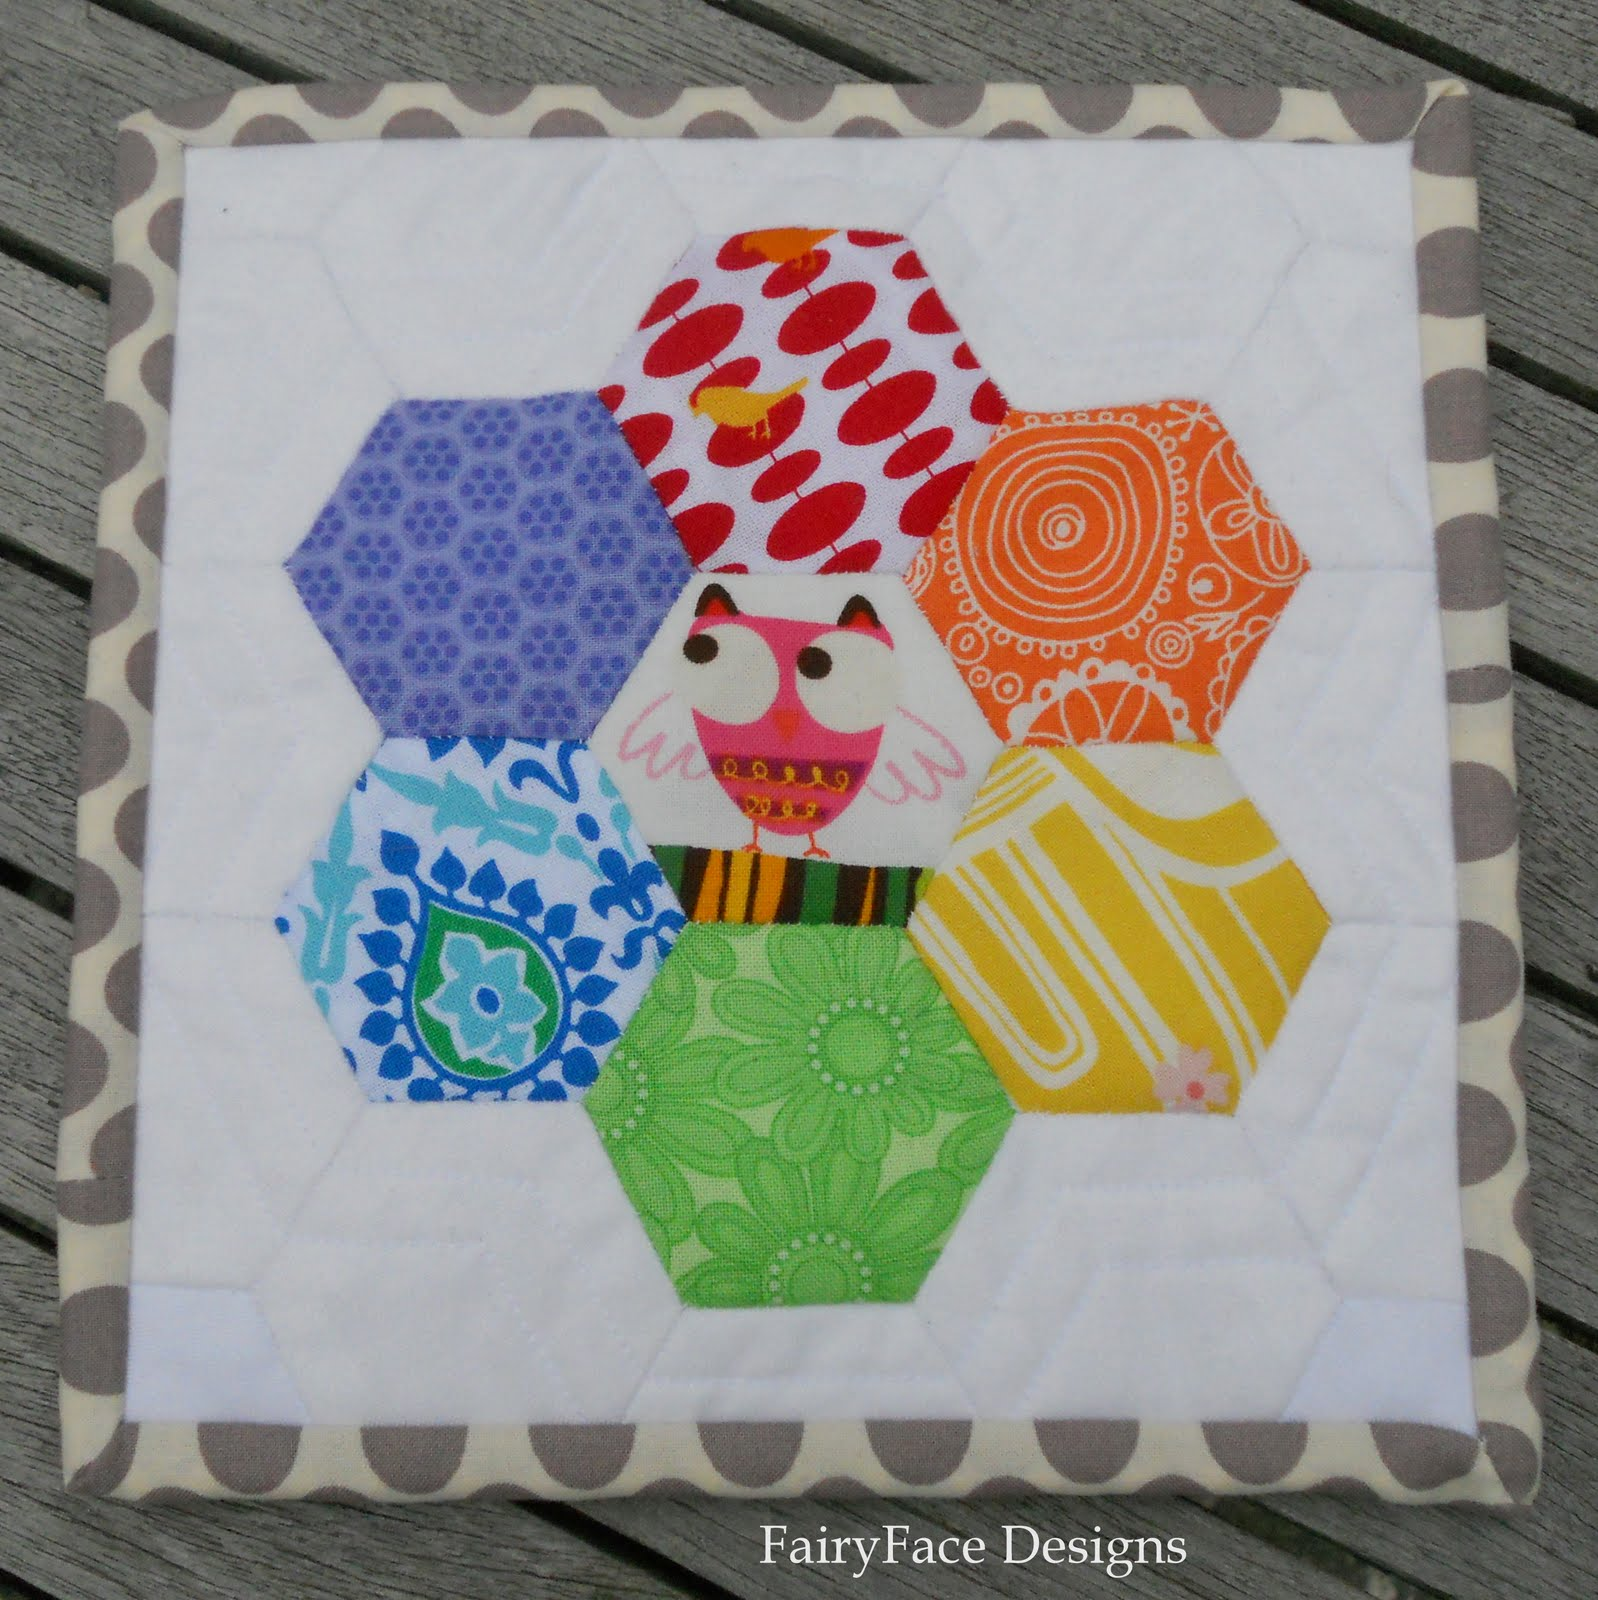 FairyFace Designs: Scrappy Rainbow Mug Rugs